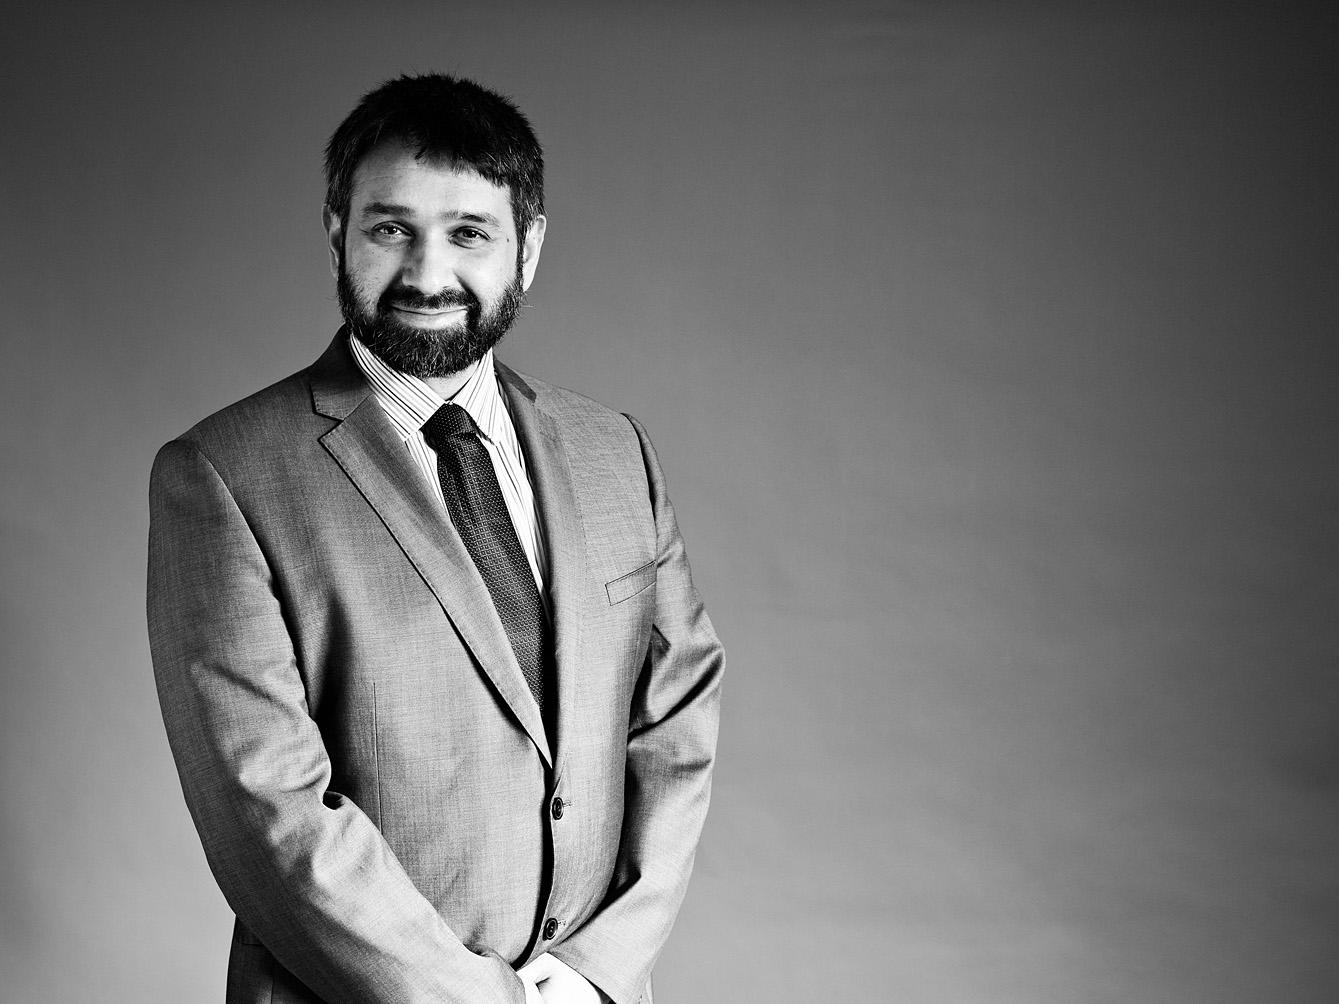 Suleman Ali profile image 4